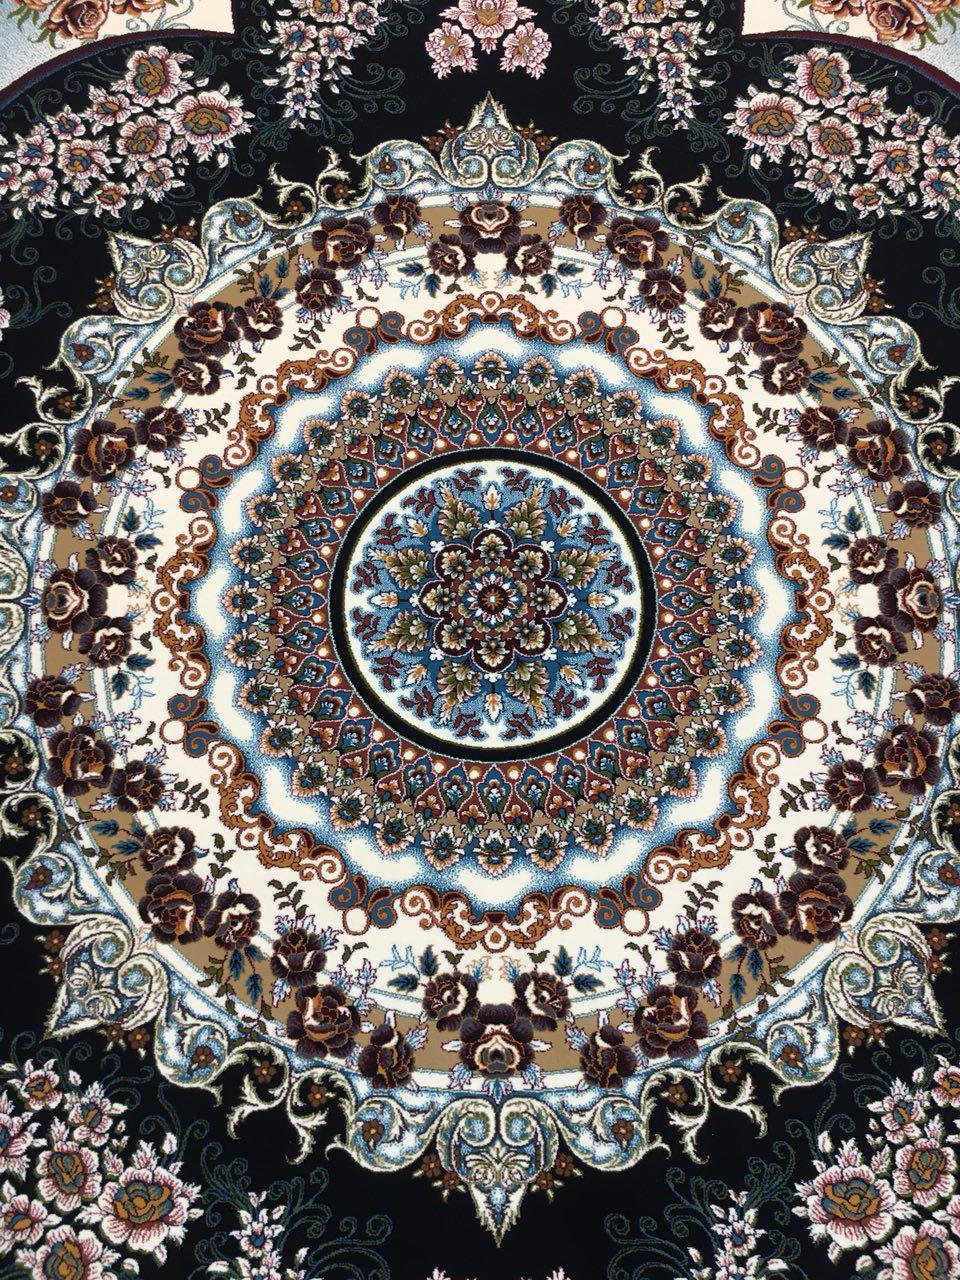 فرش ماشینی طرح ماتیاس ۷۰۰ شانه